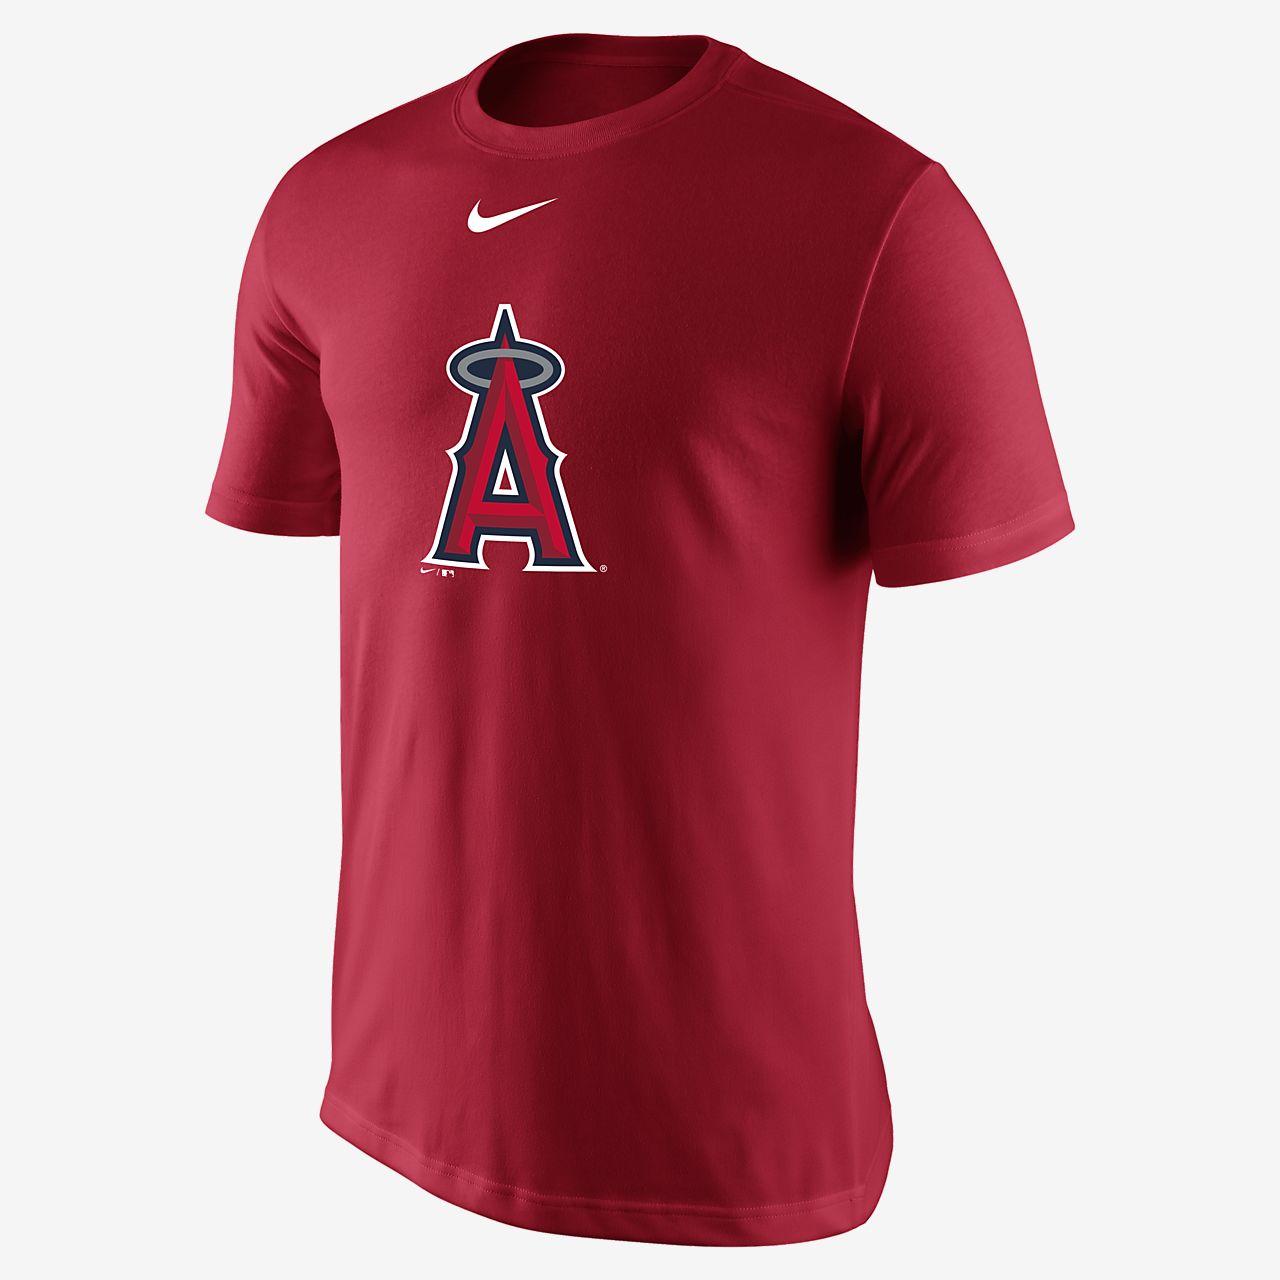 huge discount 46115 1fc74 ... Nike Legend Logo (MLB Angels) Men s T-Shirt